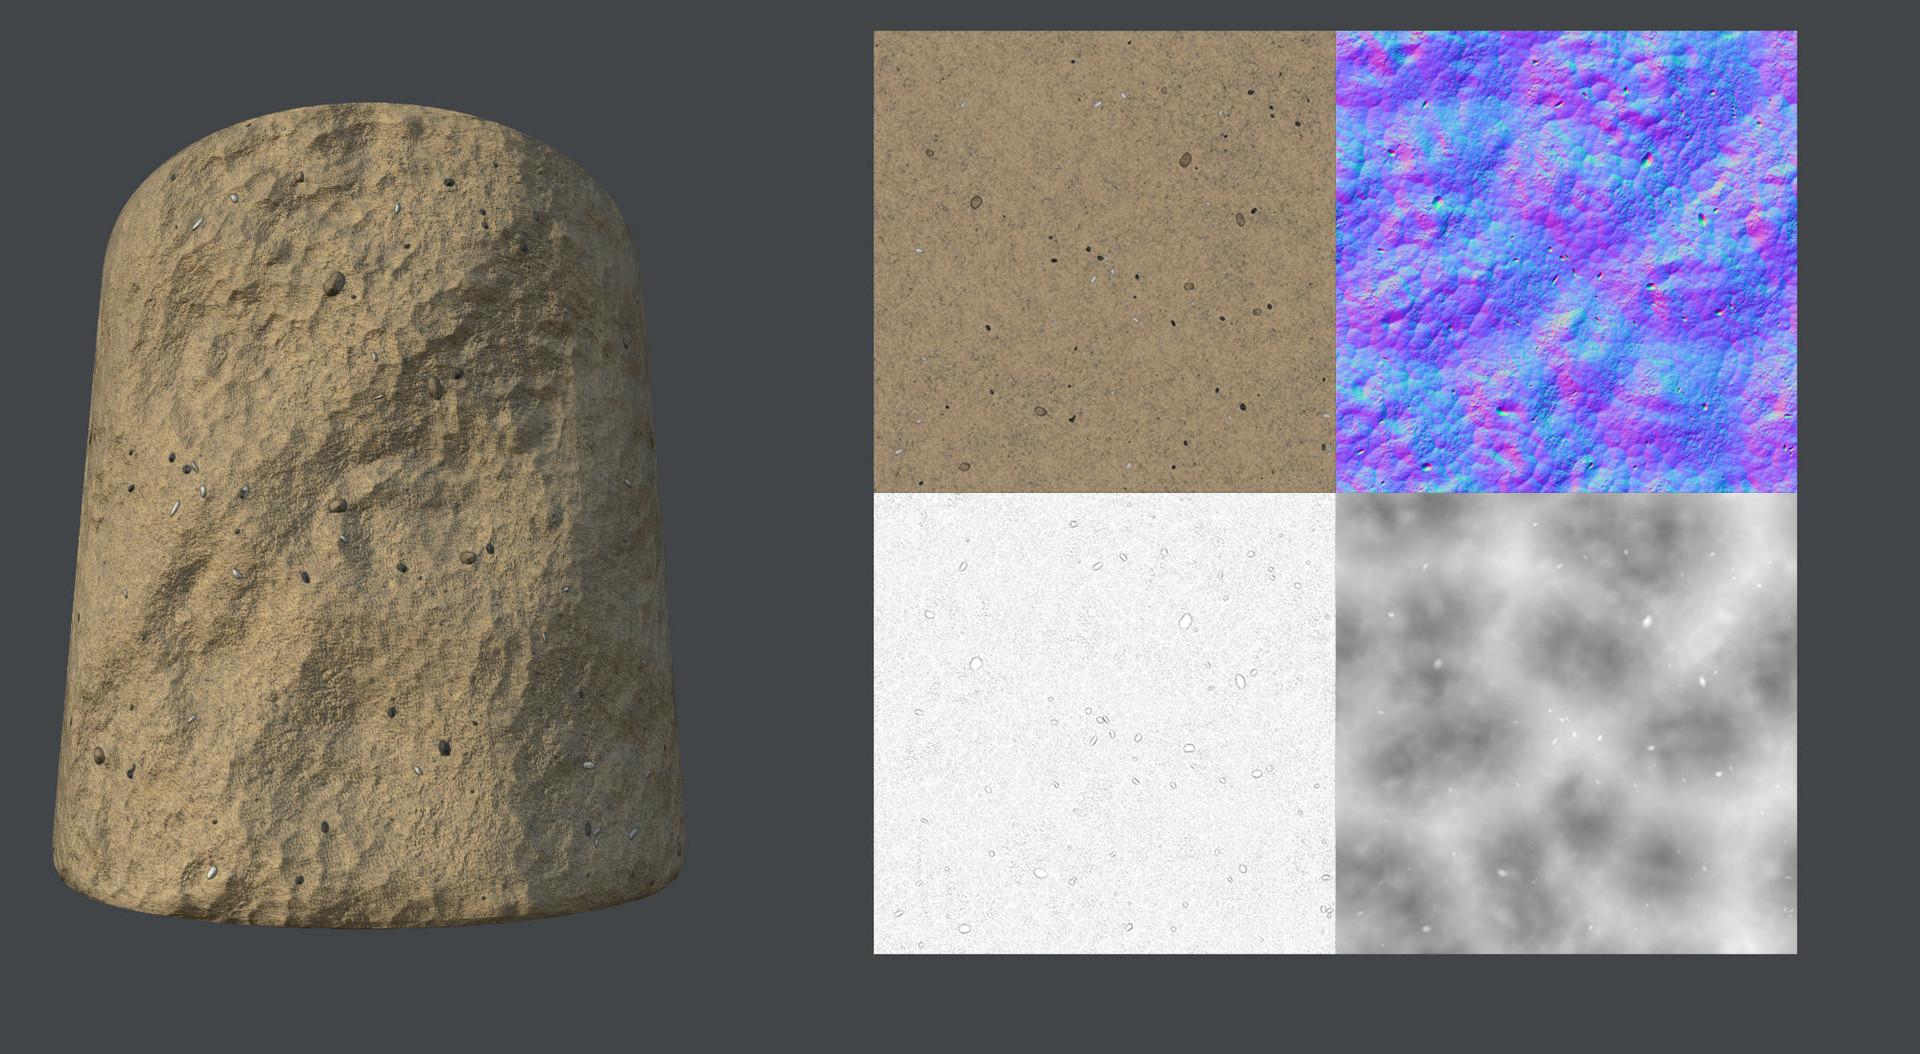 Desert Sand texture created in substance designer